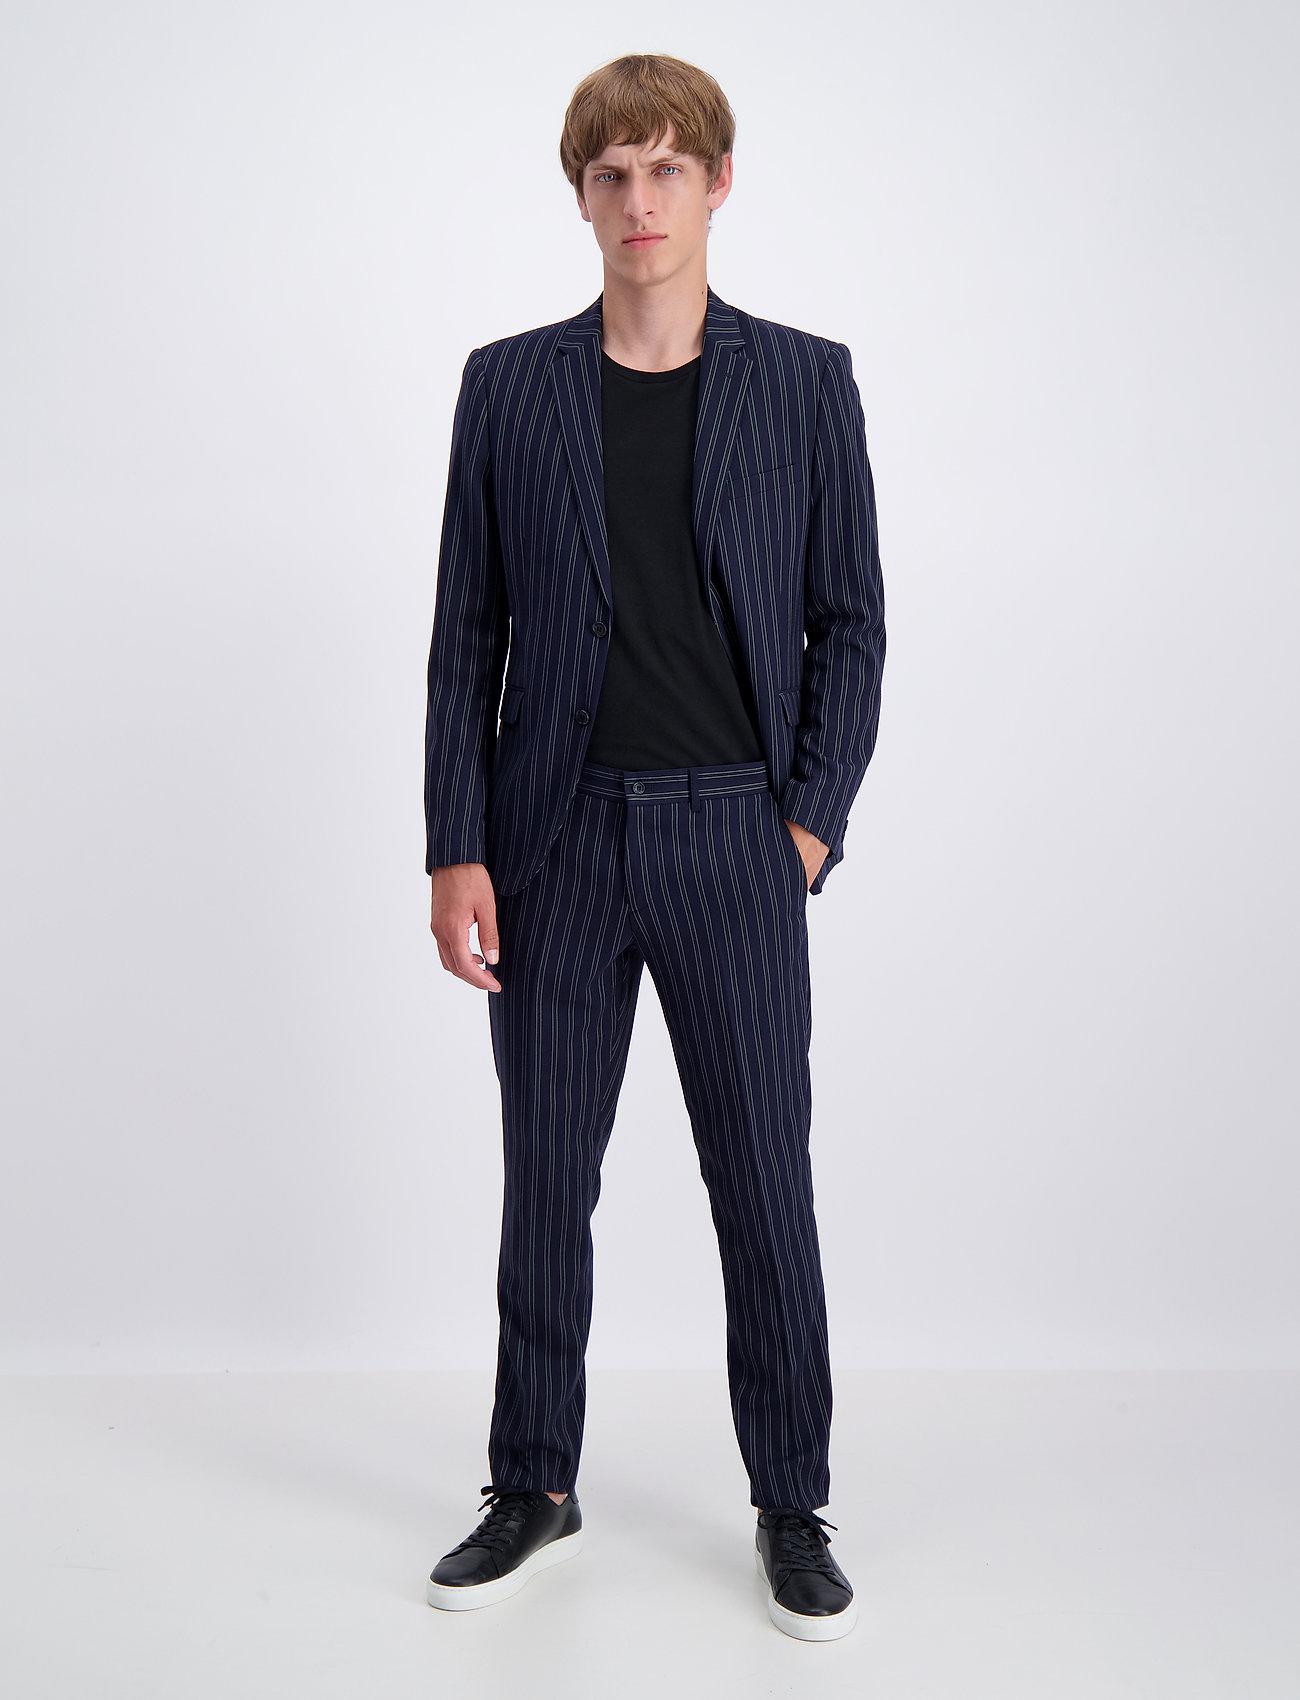 Lindbergh - Striped suit - yksiriviset puvut - dk blue - 0